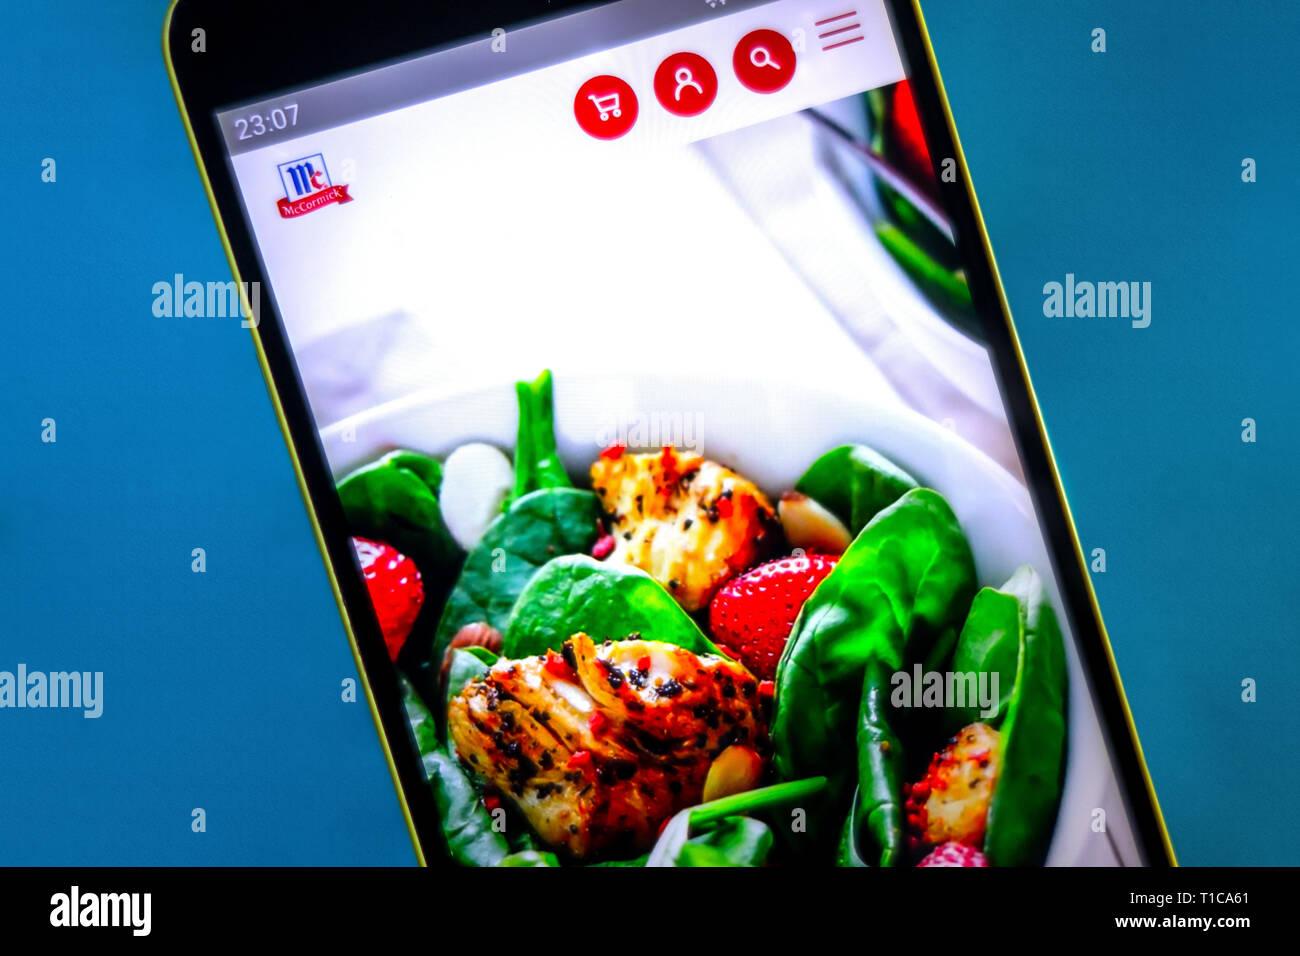 Berdyansk, Ukraine - March 24, 2019: Illustrative Editorial, McCormick website homepage. McCormick logo visible on the phone screen. - Stock Image